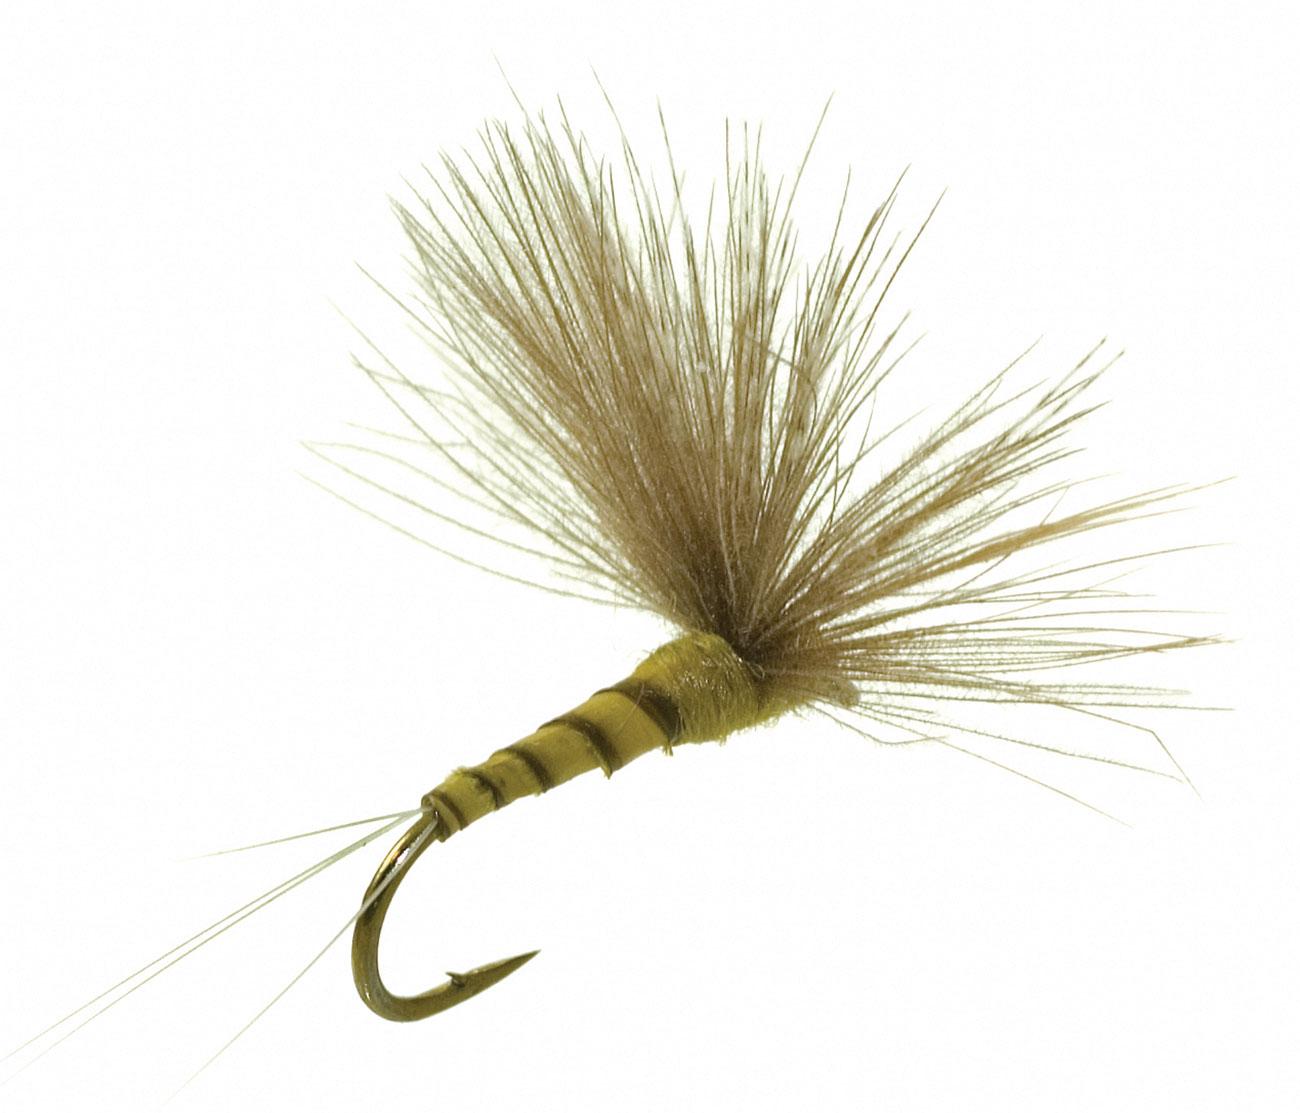 Umpqua CDC Biot Comparadun BWO Fly Fishing Dry Flies Multi-packs